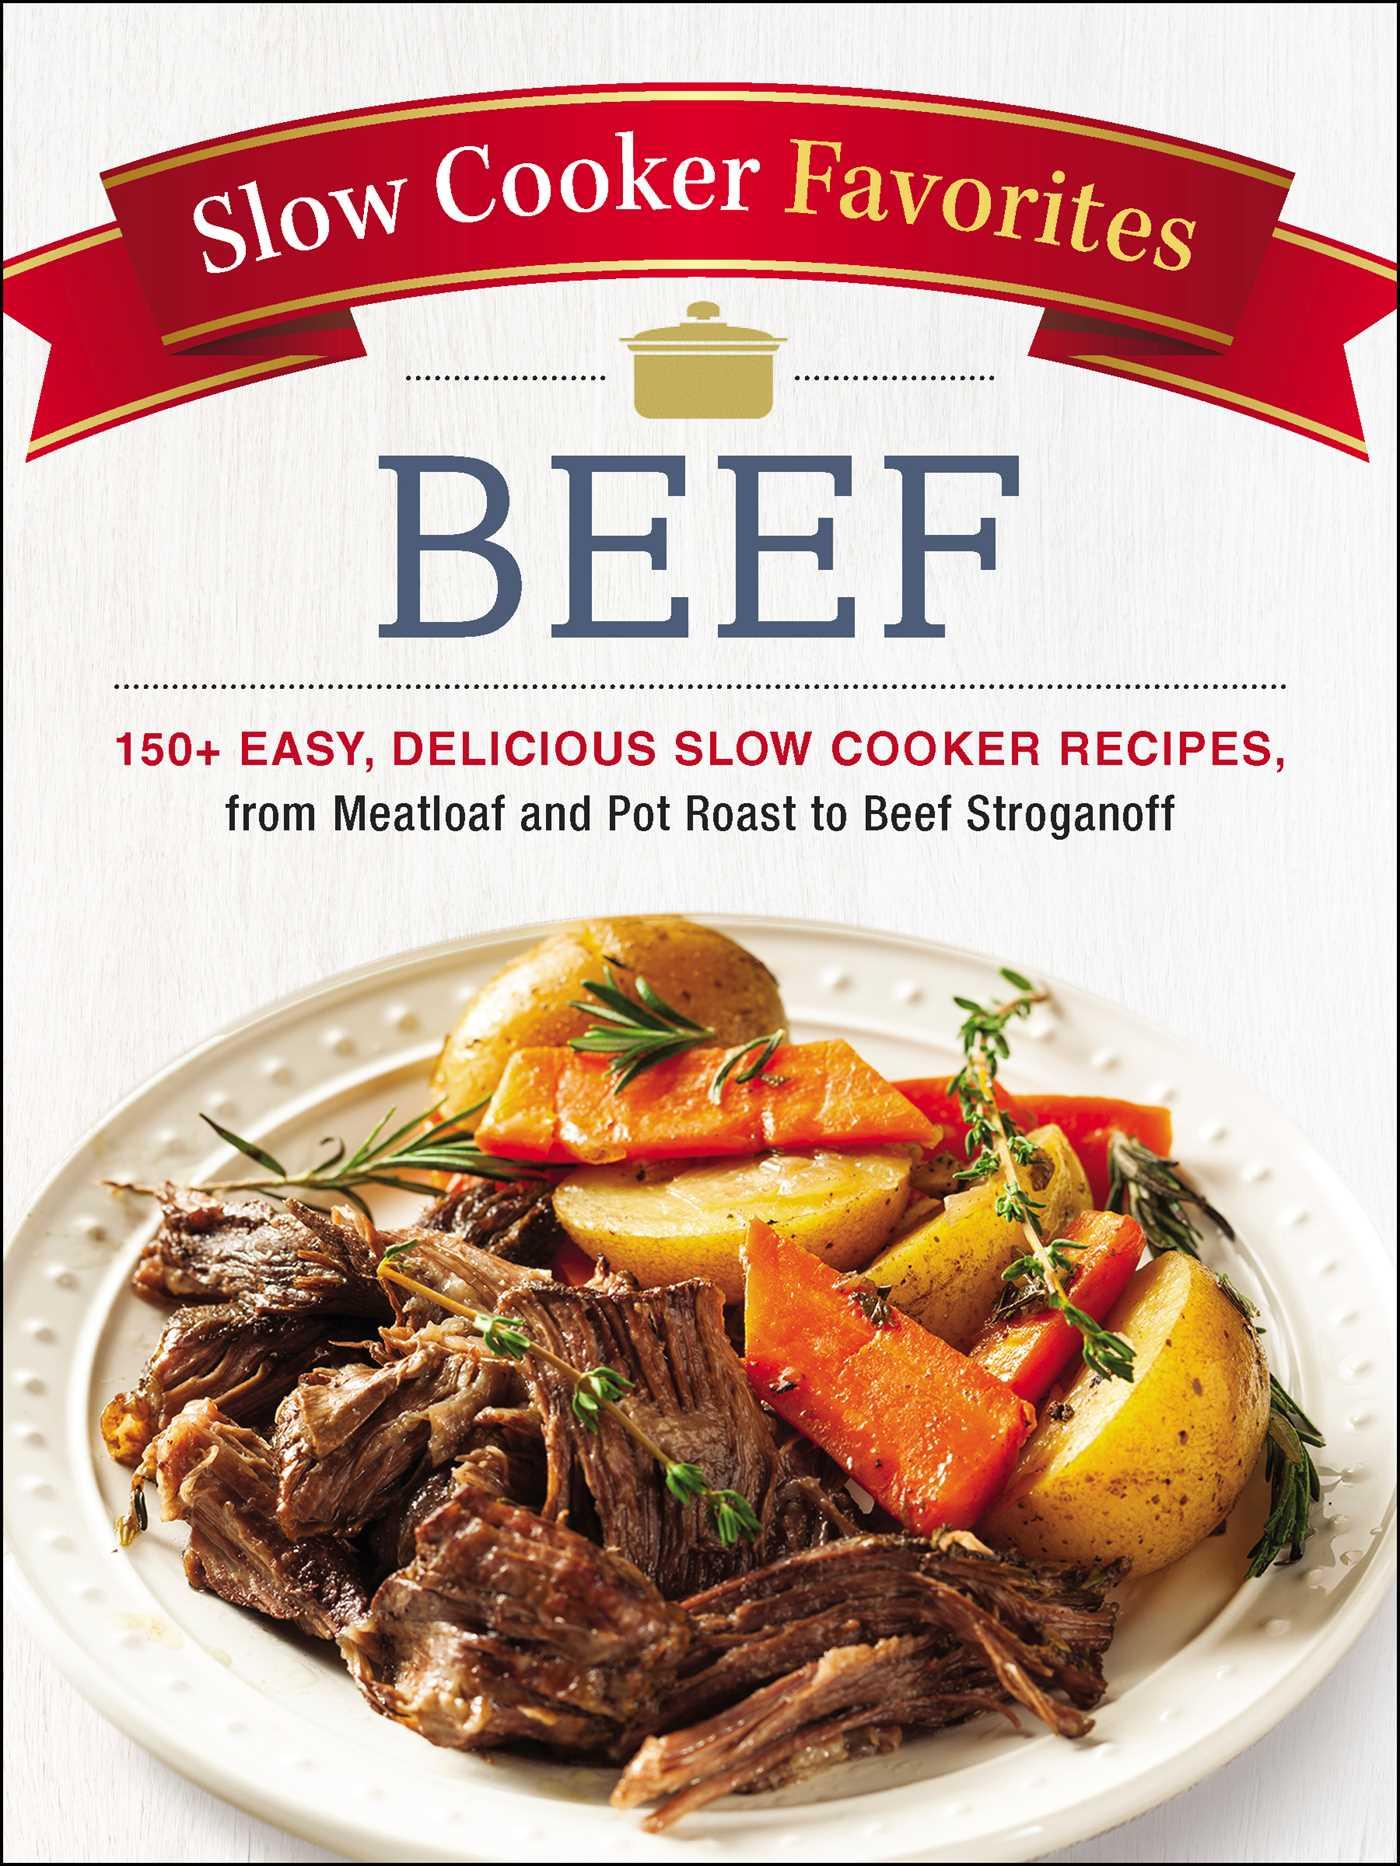 Slow cooker favorites beef 9781507206386 hr